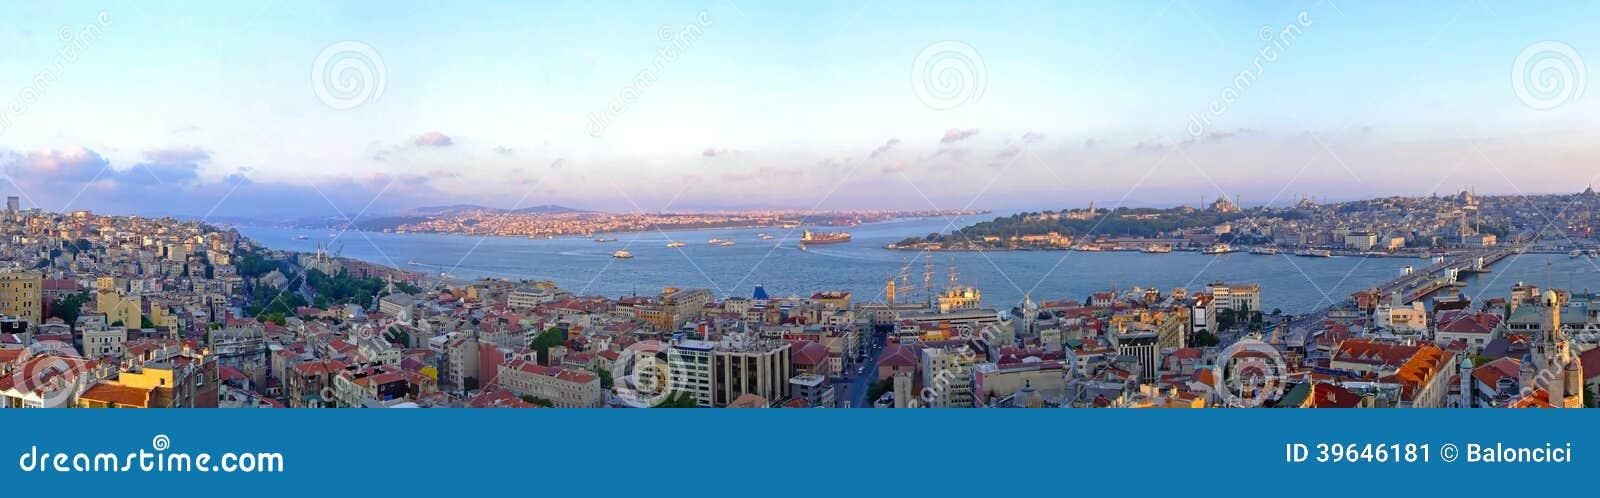 Panorama di Costantinopoli